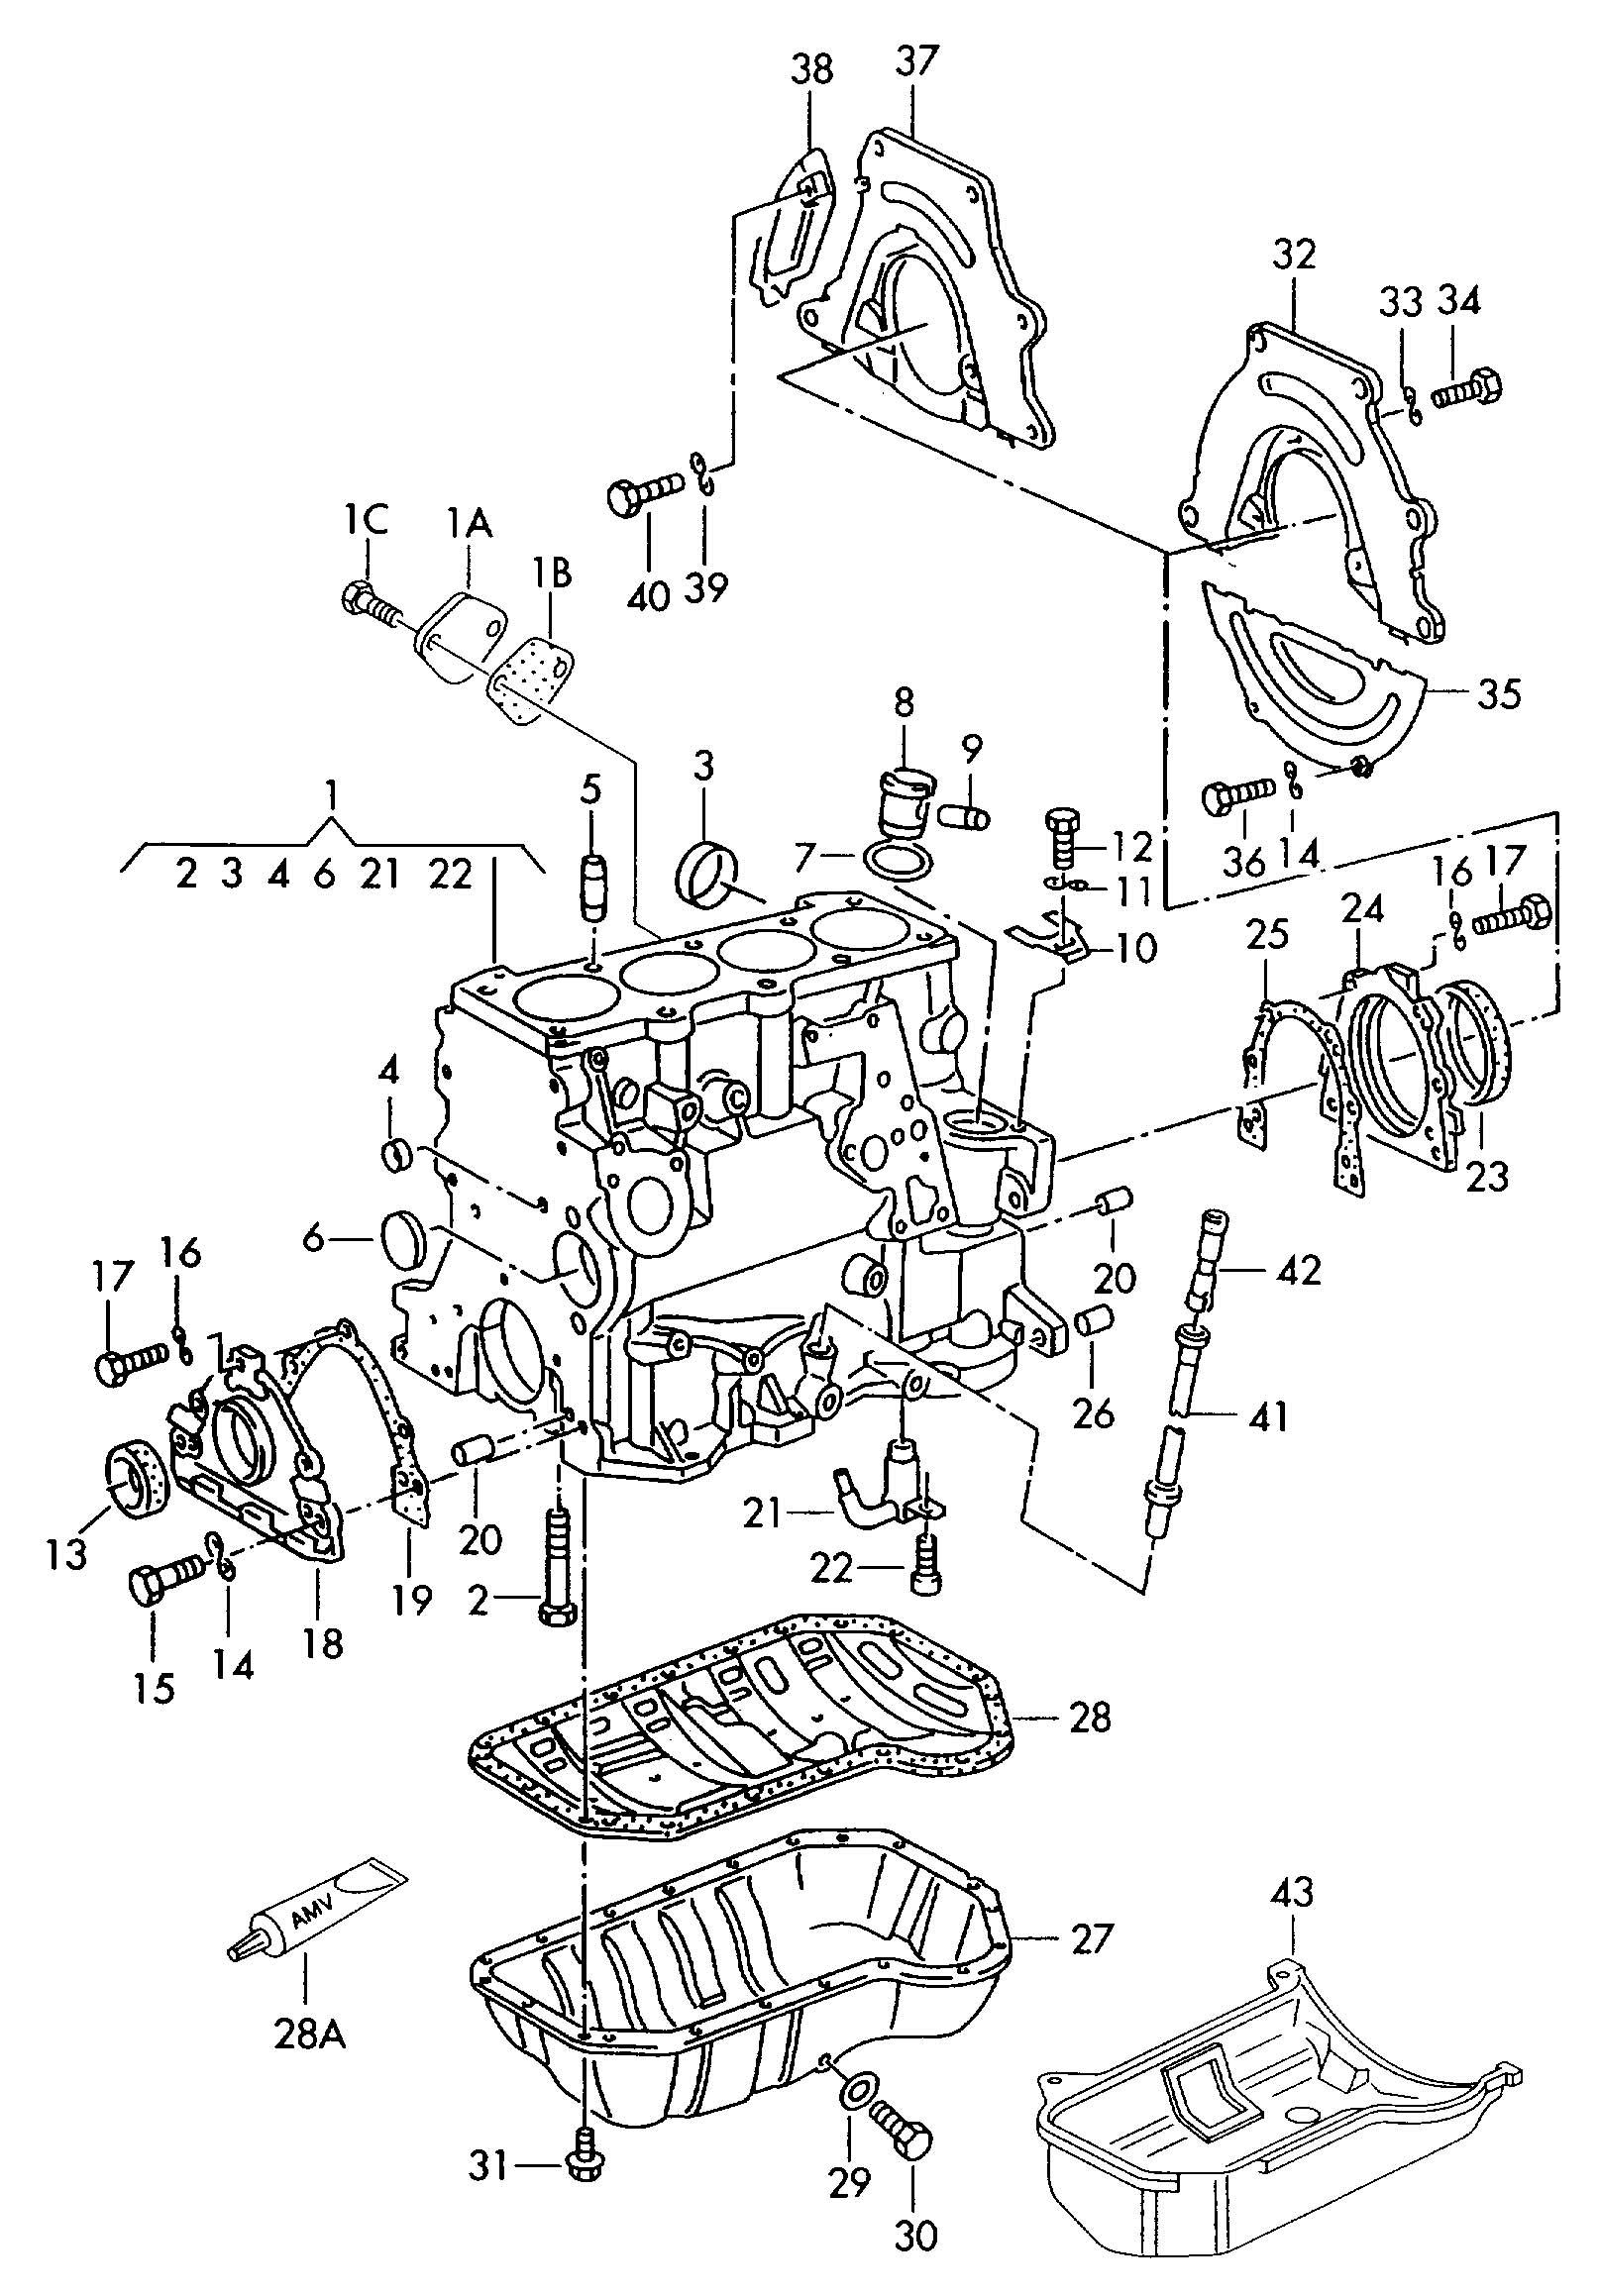 Volkswagen Jetta Cover plate also use:. Upper. Oben